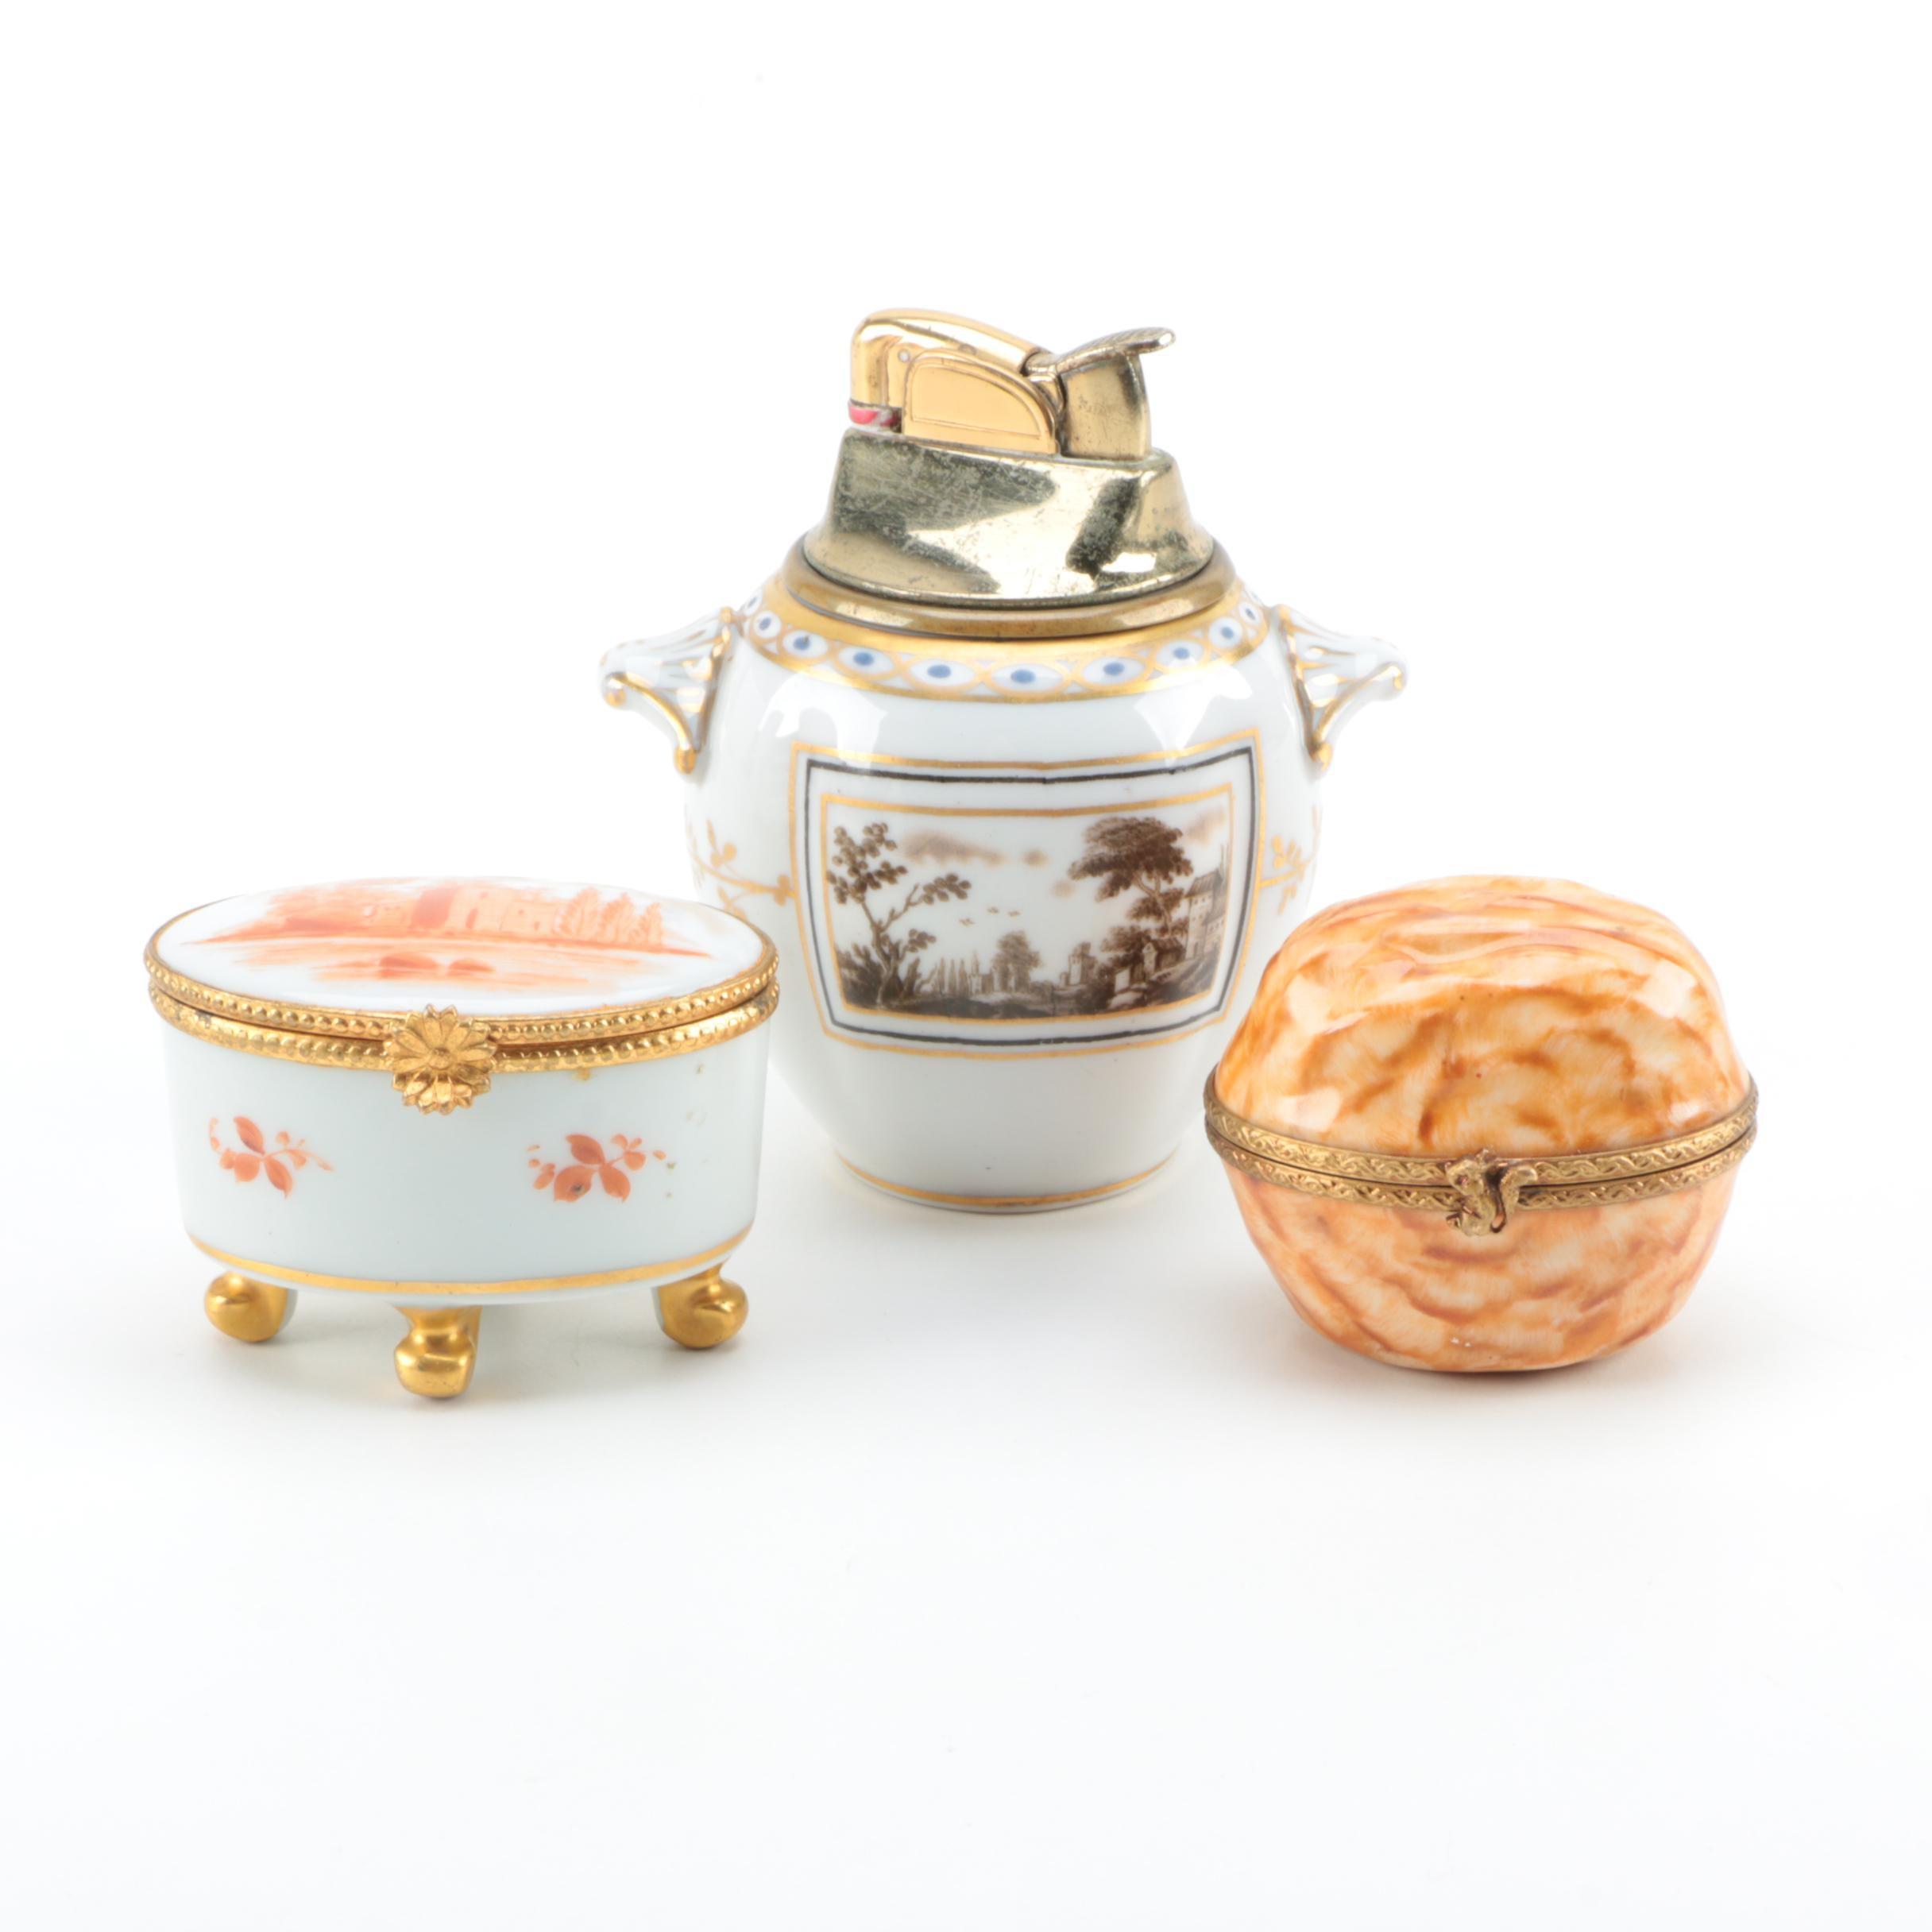 Limoges Trinket Boxes and Richard Ginori Porcelain Refillable Lighter